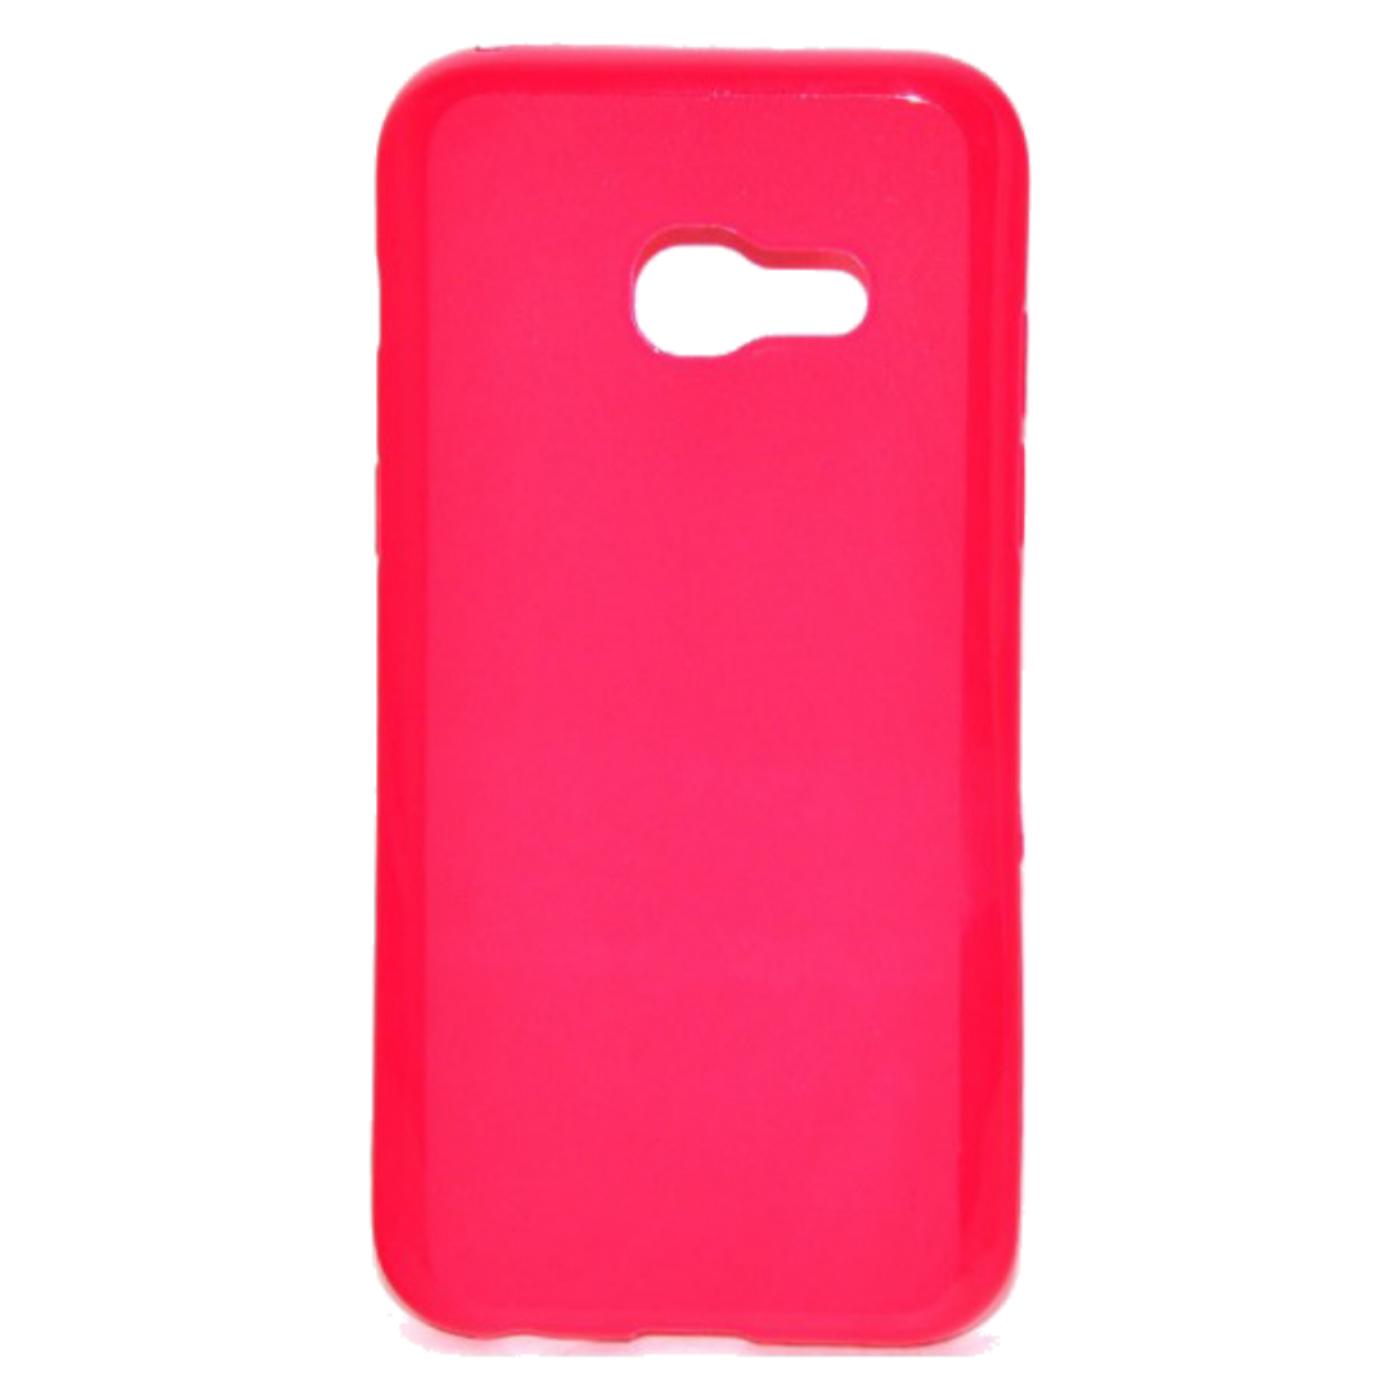 Futrola za mobitel Samsung A5 2017, ALIN, pink